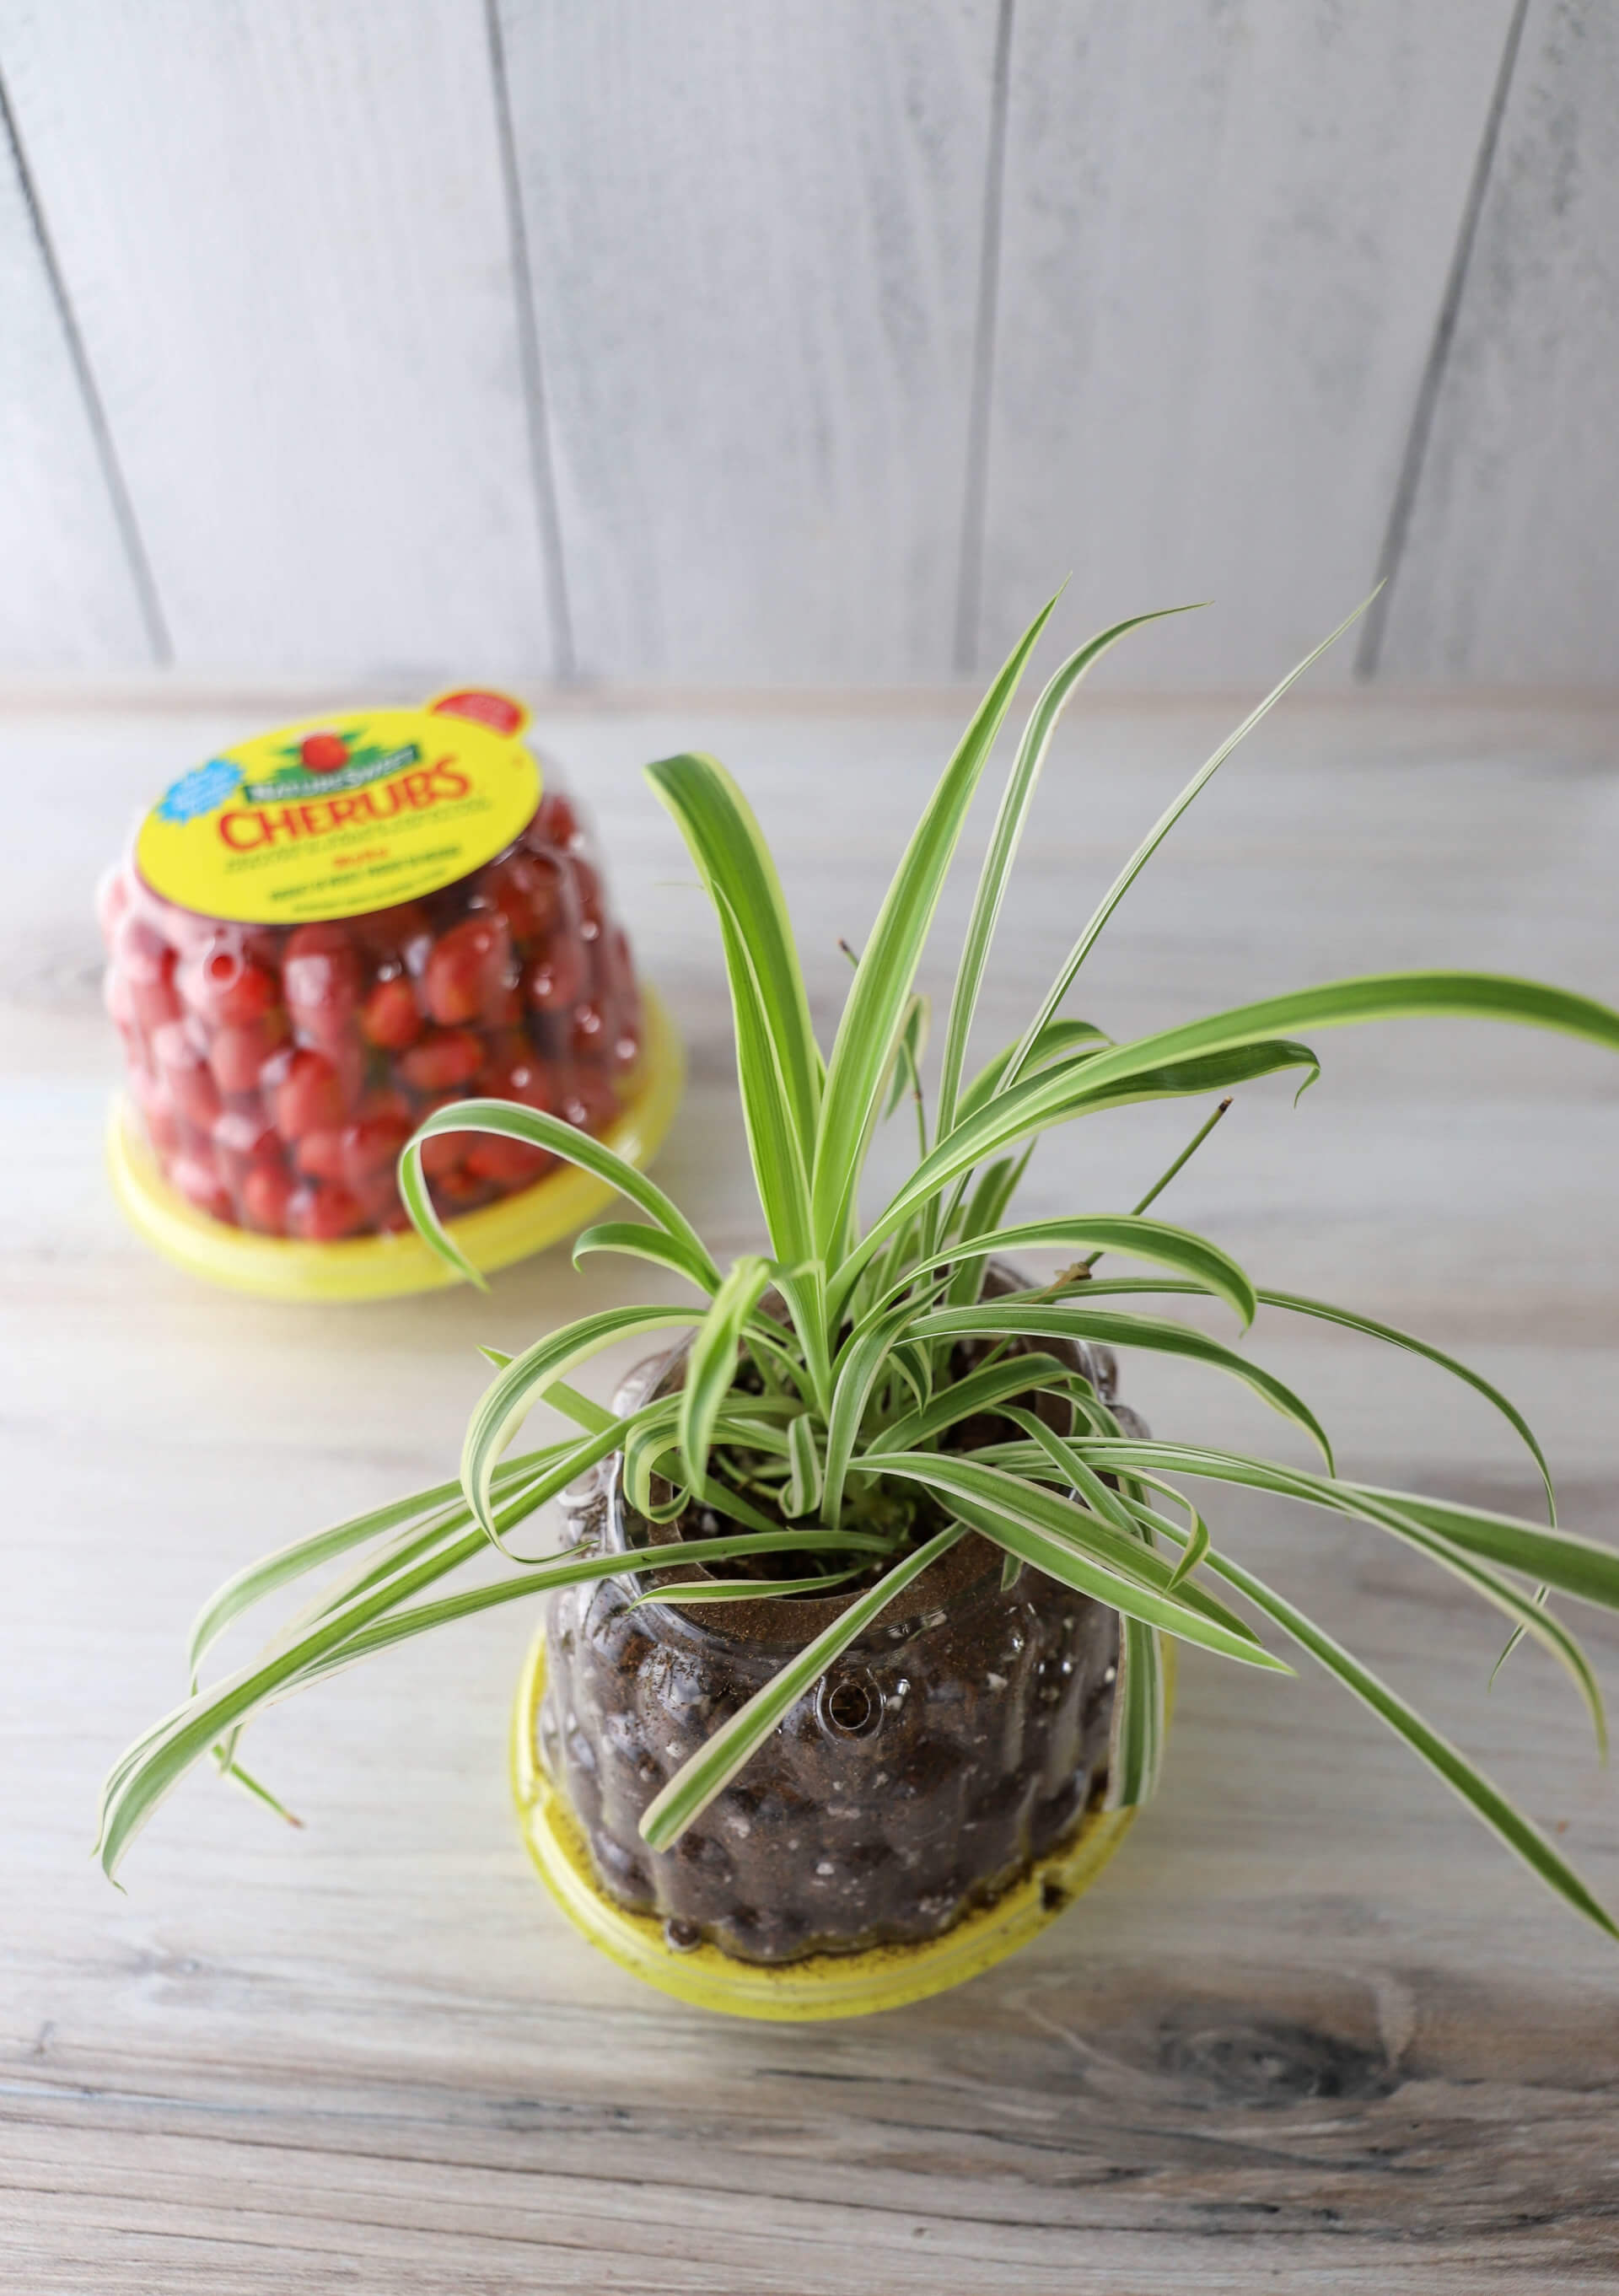 Planter or Seed Starter